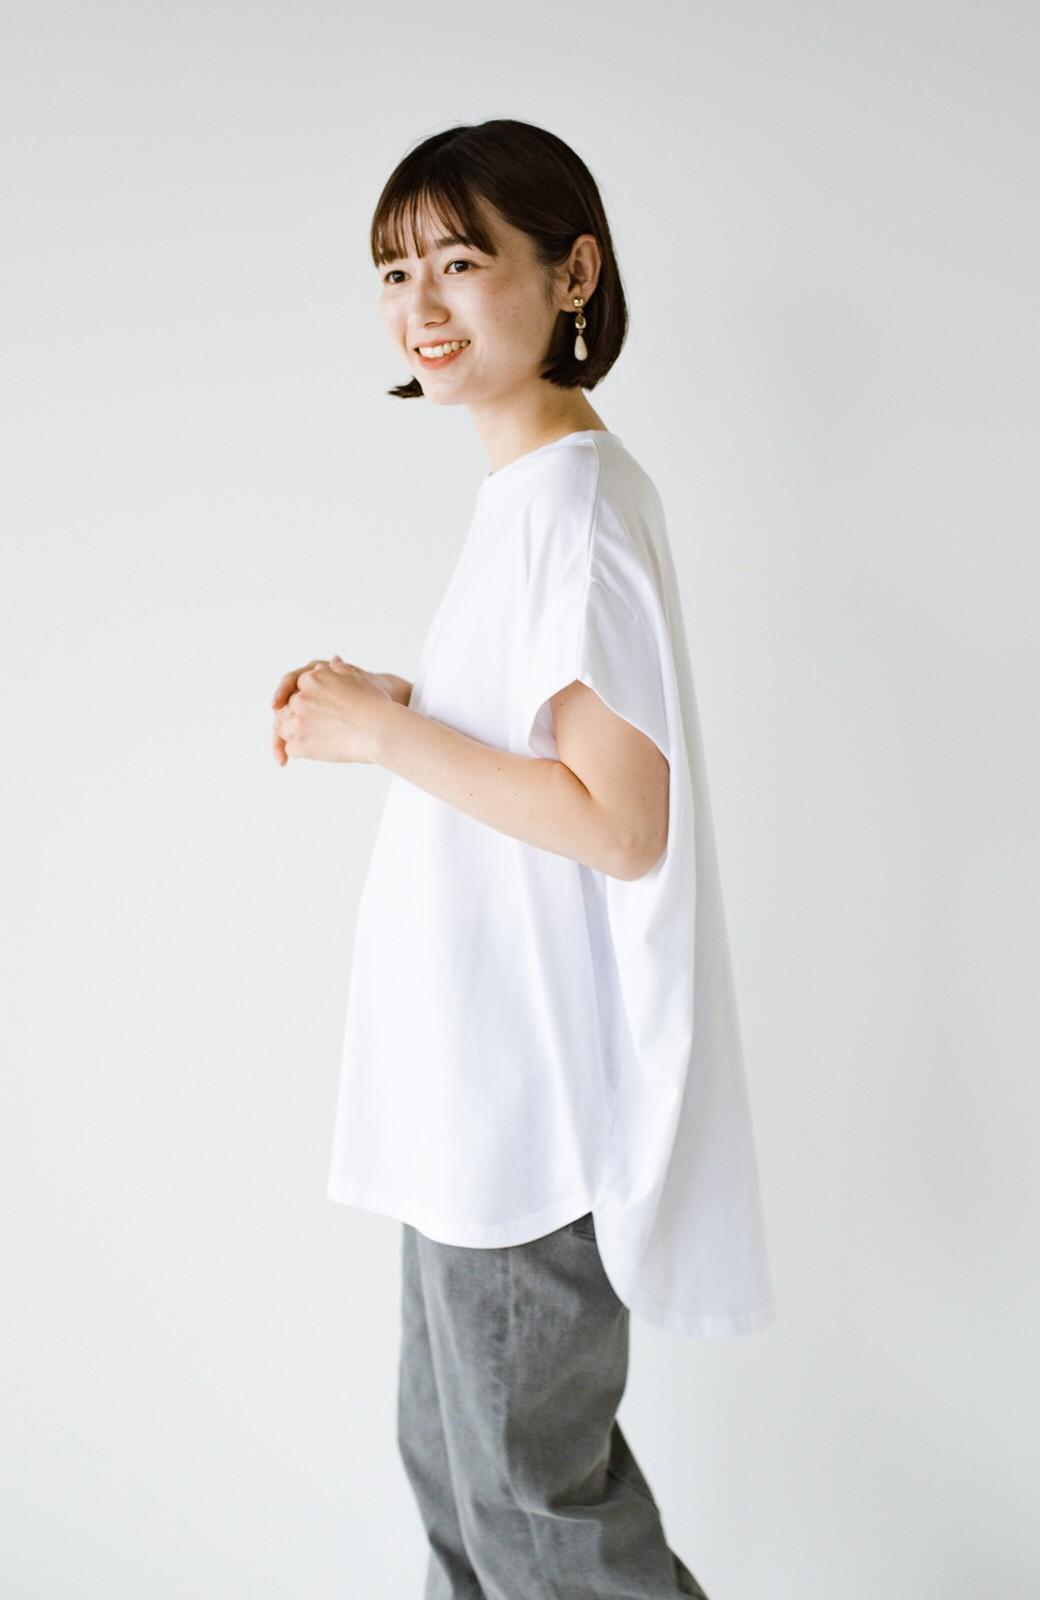 haco! PBPオーガニックコットン 楽ちんなのにブラウス気分で着られる大人のおめかしTシャツ <ホワイト>の商品写真25